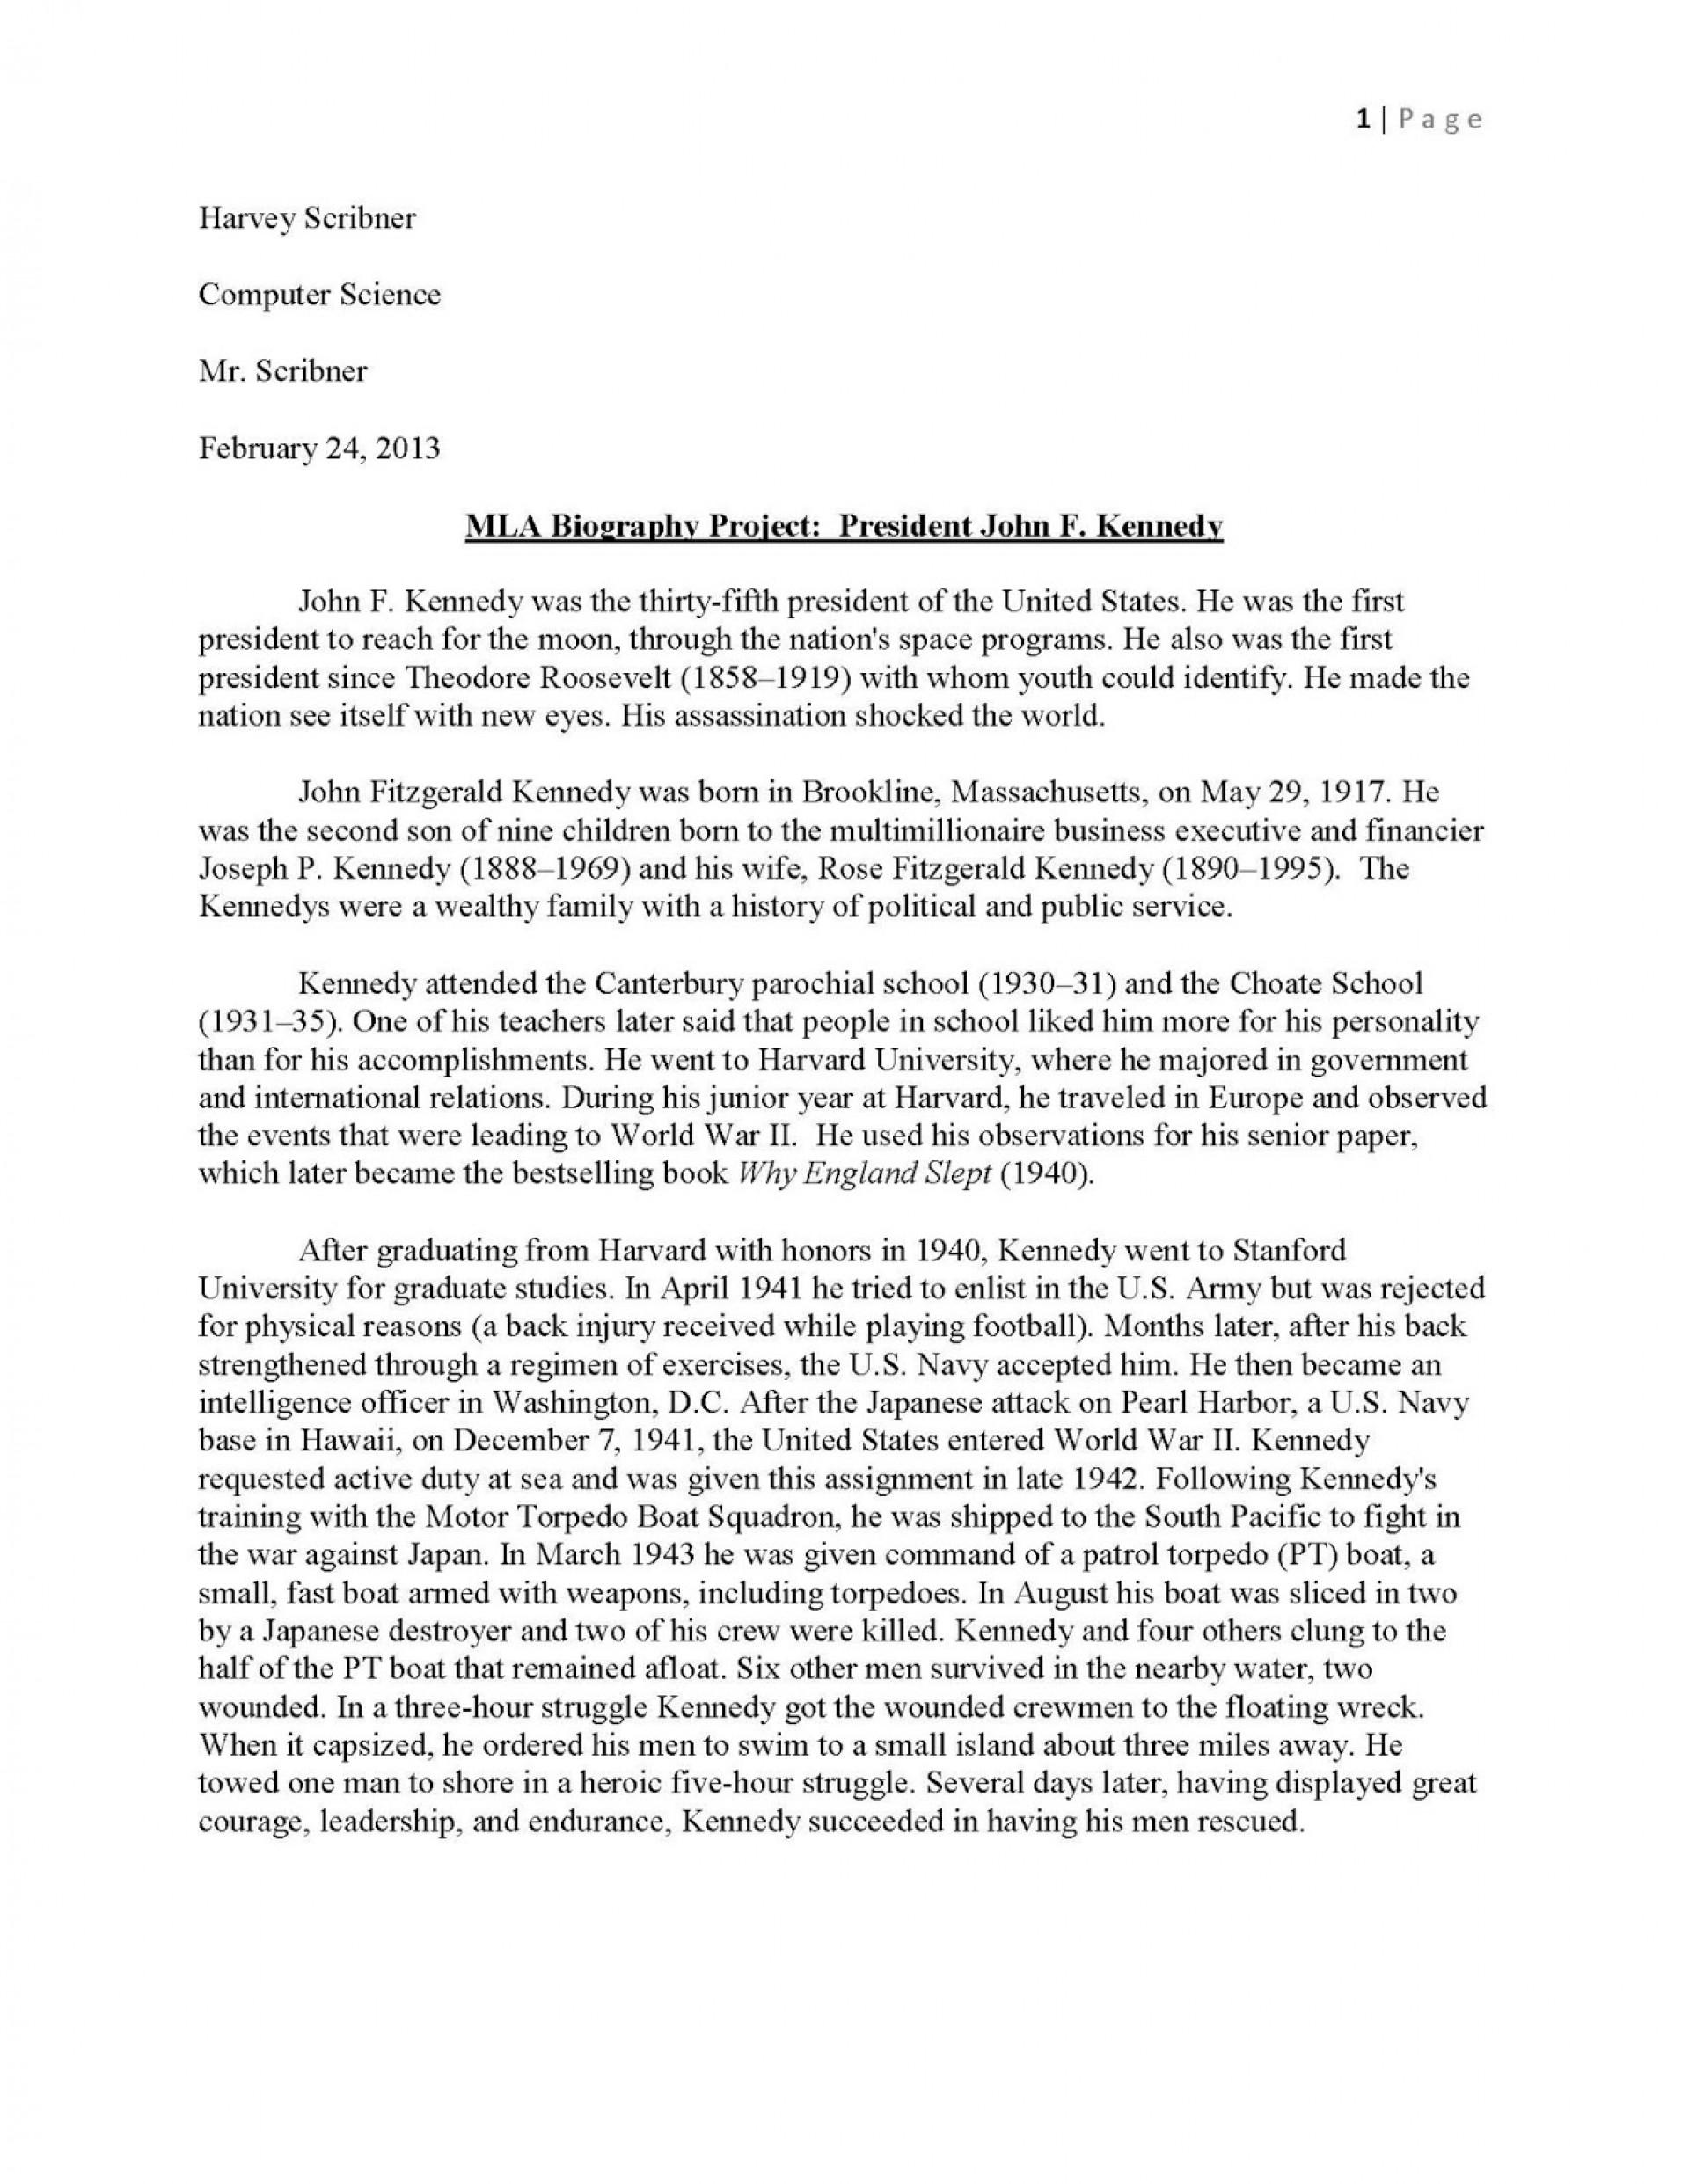 007 Essay Example Biography Jfkmlashortformbiographyreportexample Page 1 Impressive Conclusion Examples College Titles 1920